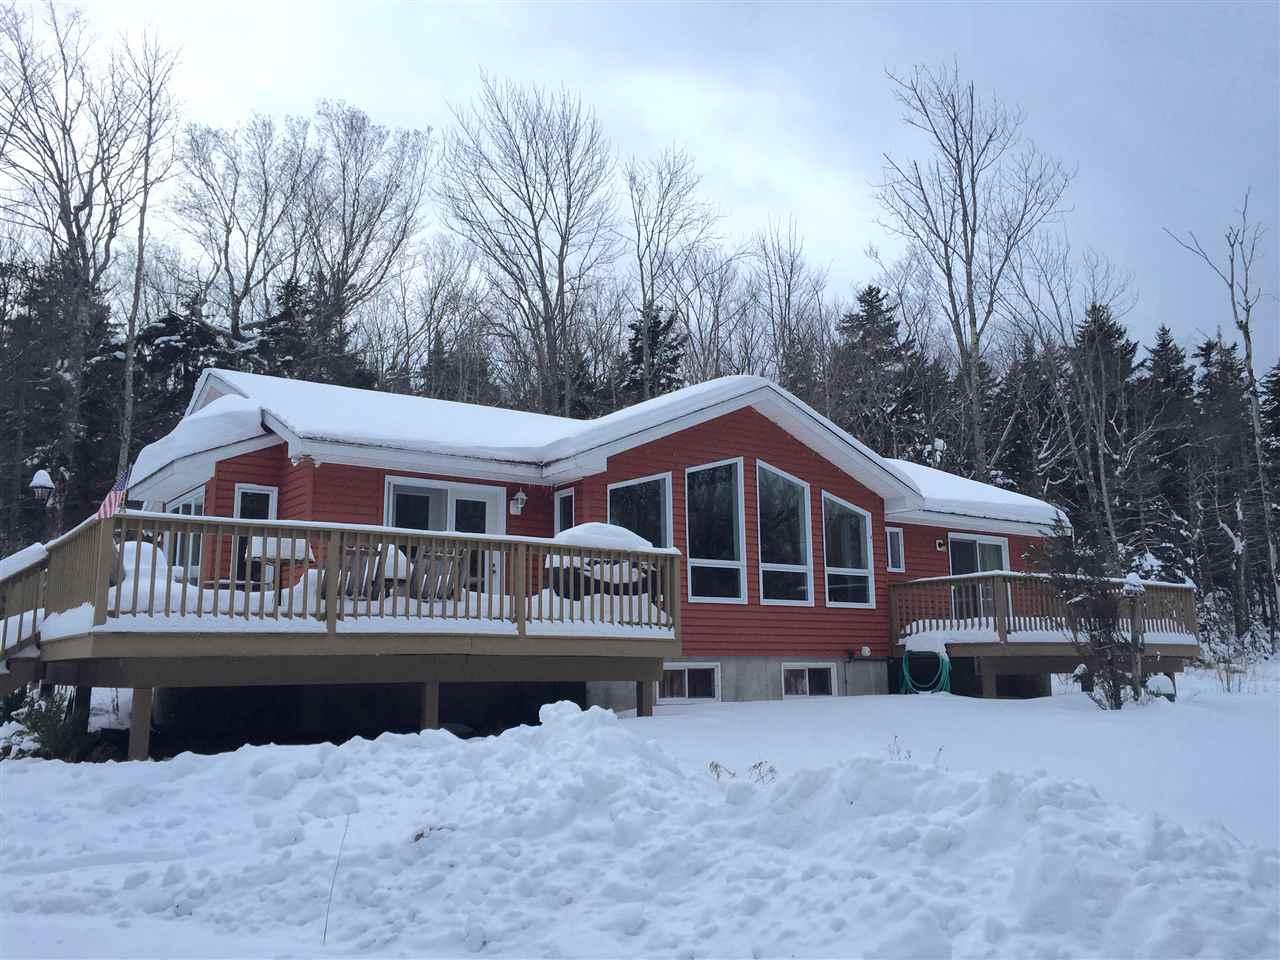 Mount-Snow-Real-Estate-4624701-0